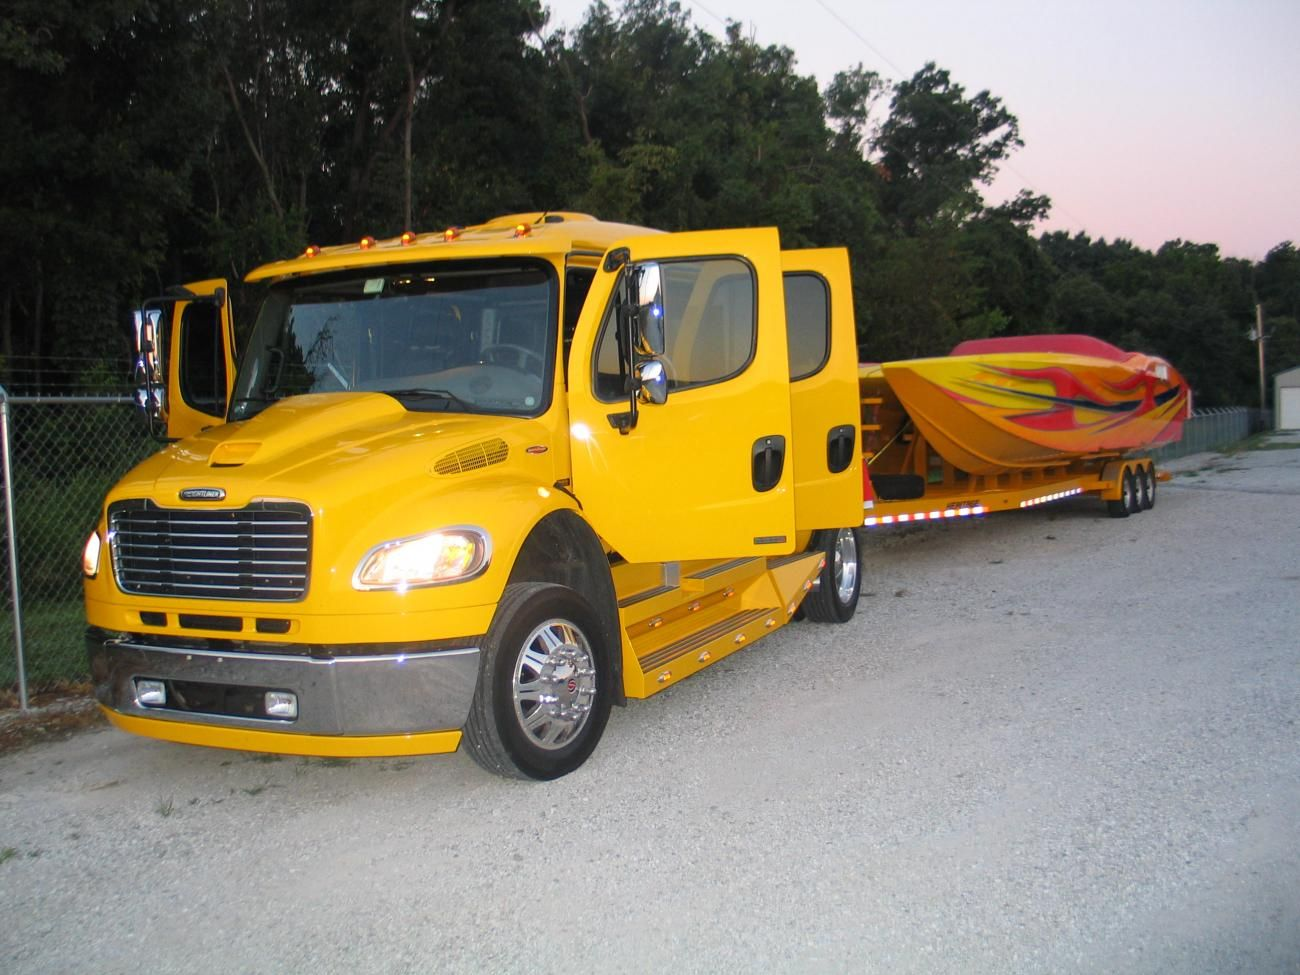 hight resolution of custom freightliner hauler extreme suv luxury toy haulers